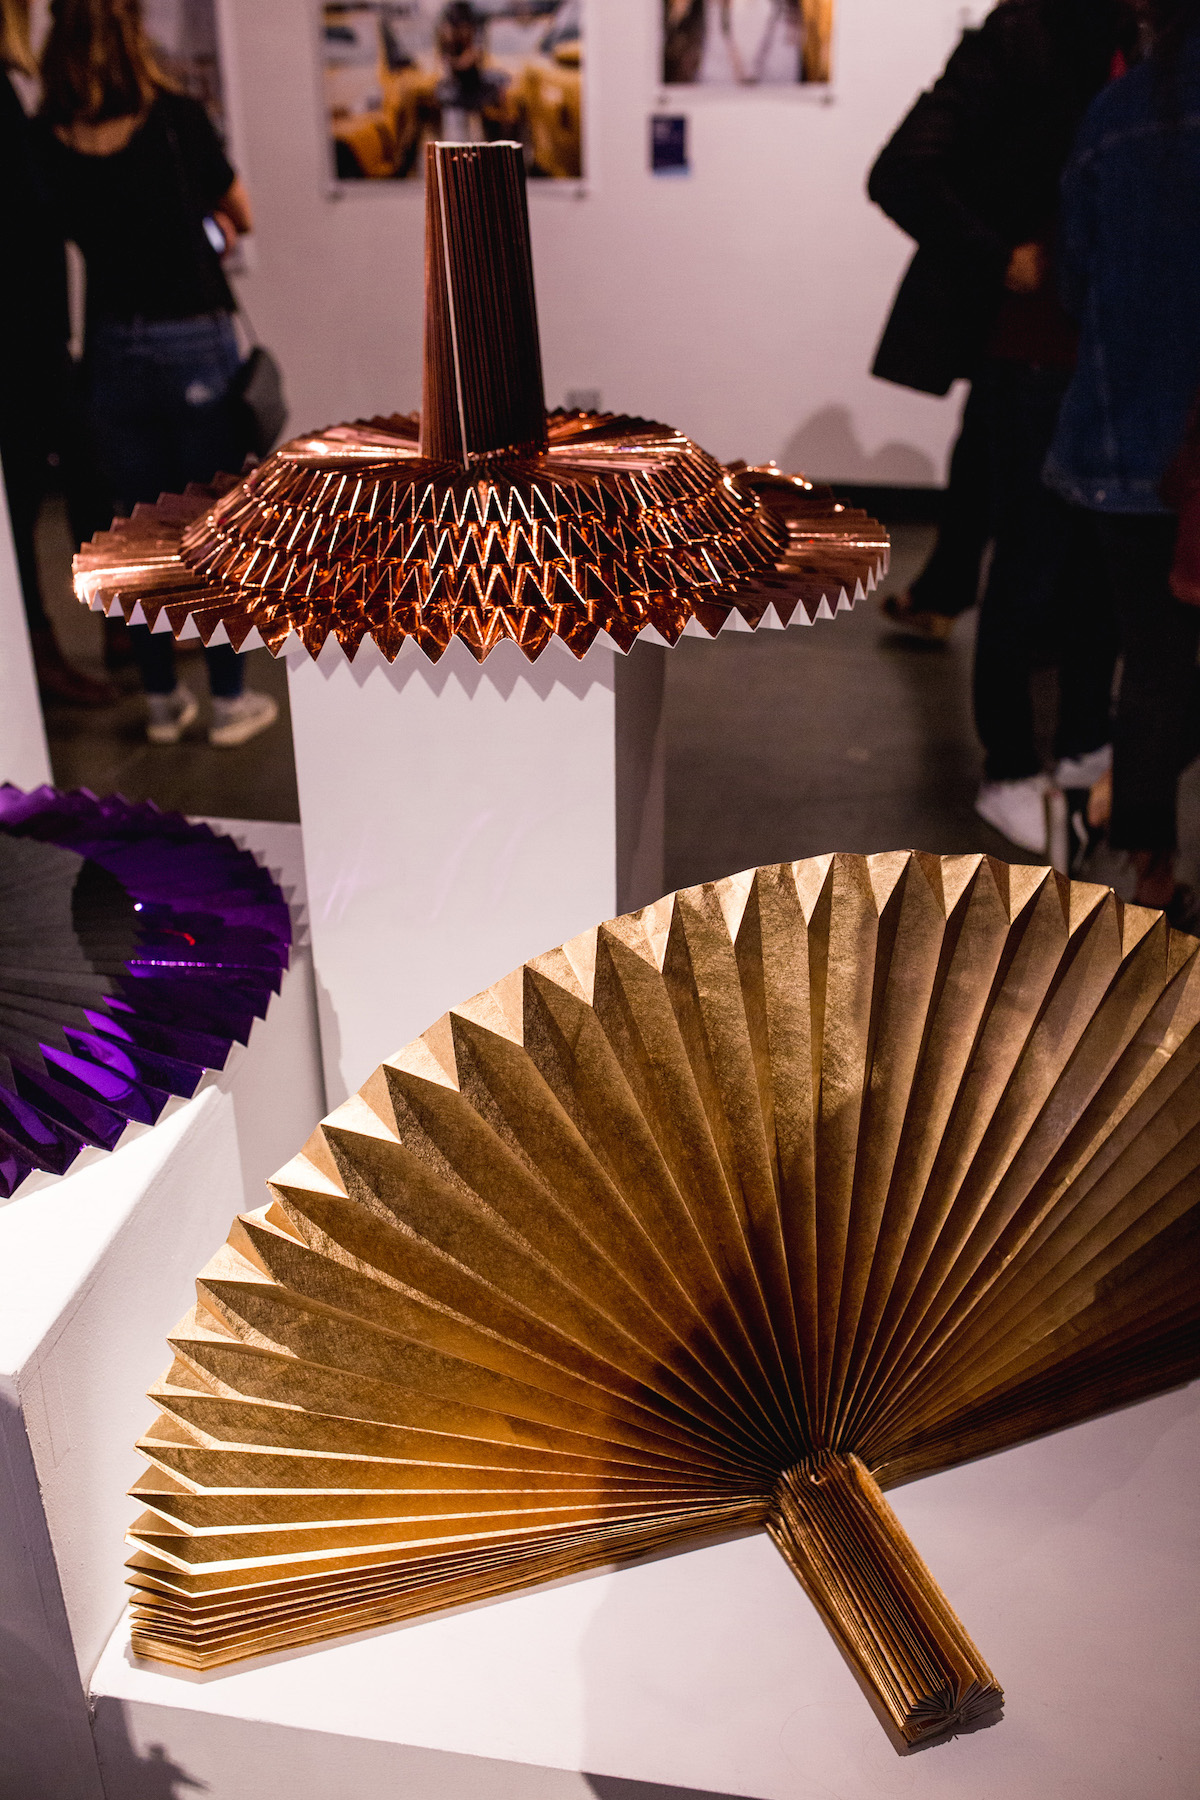 miss-cloudy-pauline-loctin-plie-project-melika-dez-ausgang-exhibition-paper-art-origami-ballerina-ballet-dancer-pointe-fold-24.jpg